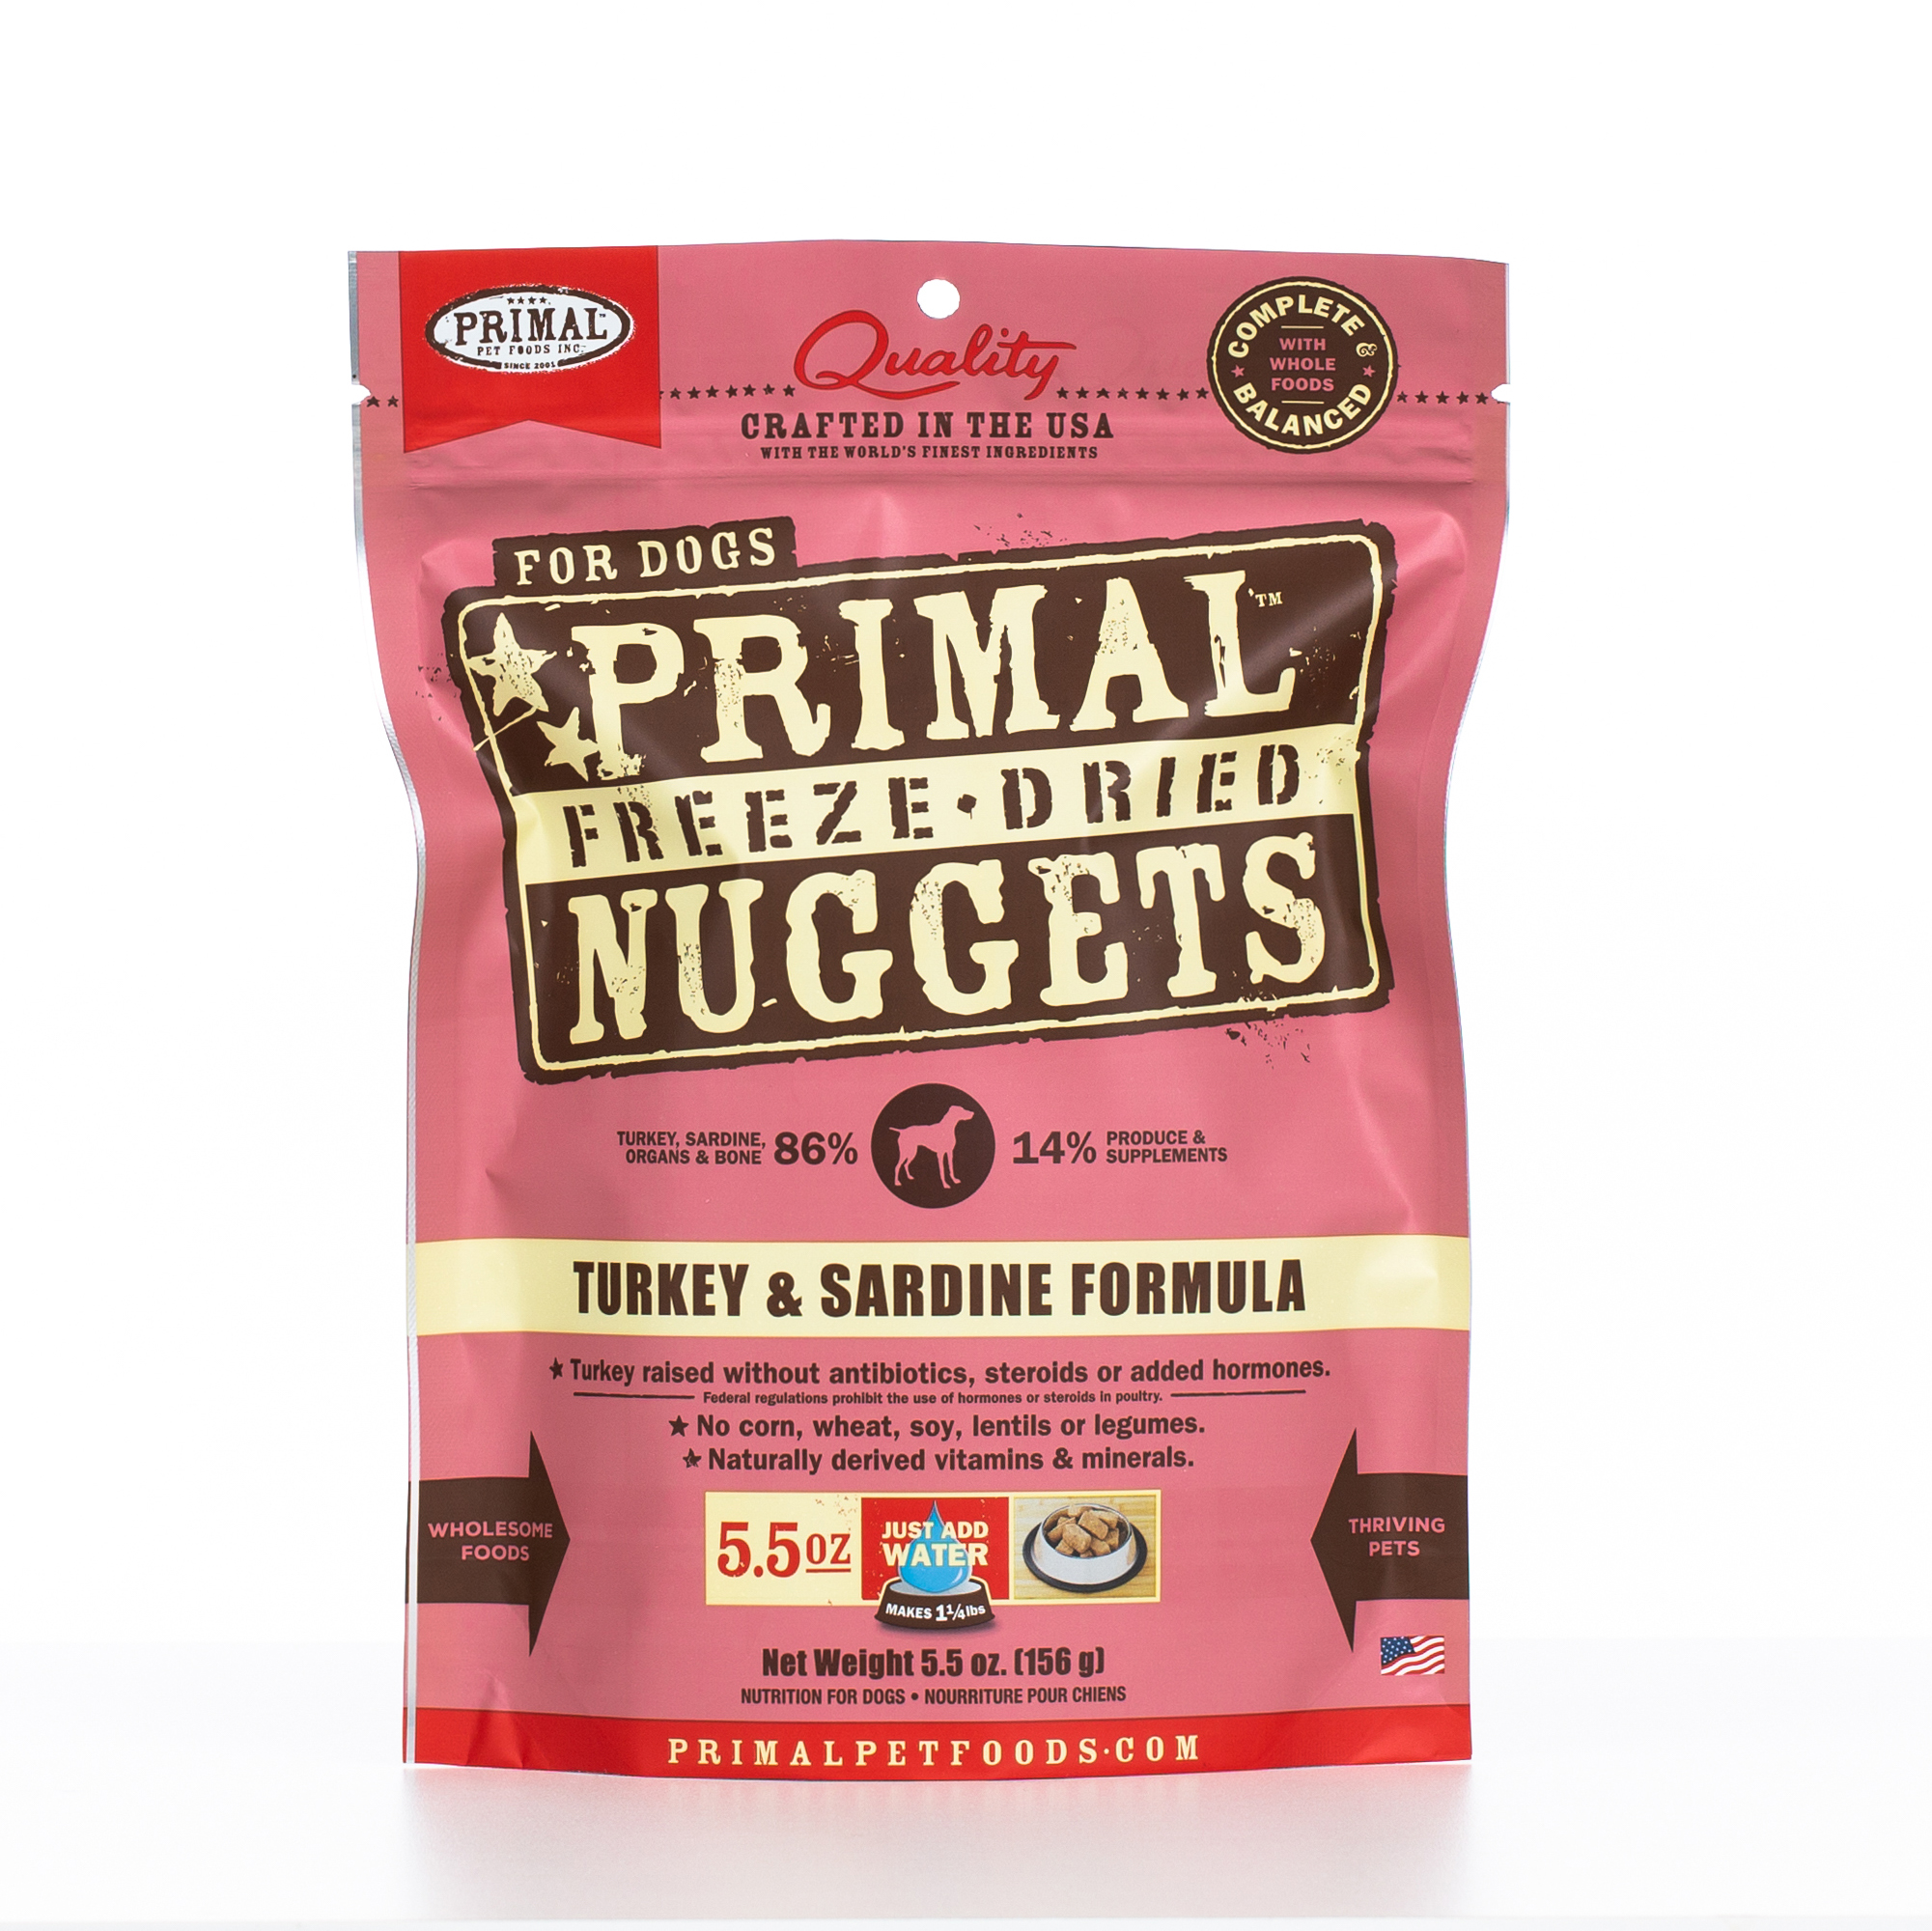 Primal Raw Freeze-Dried Nuggets Turkey & Sardine Formula Dog Food, 5.5-oz bag